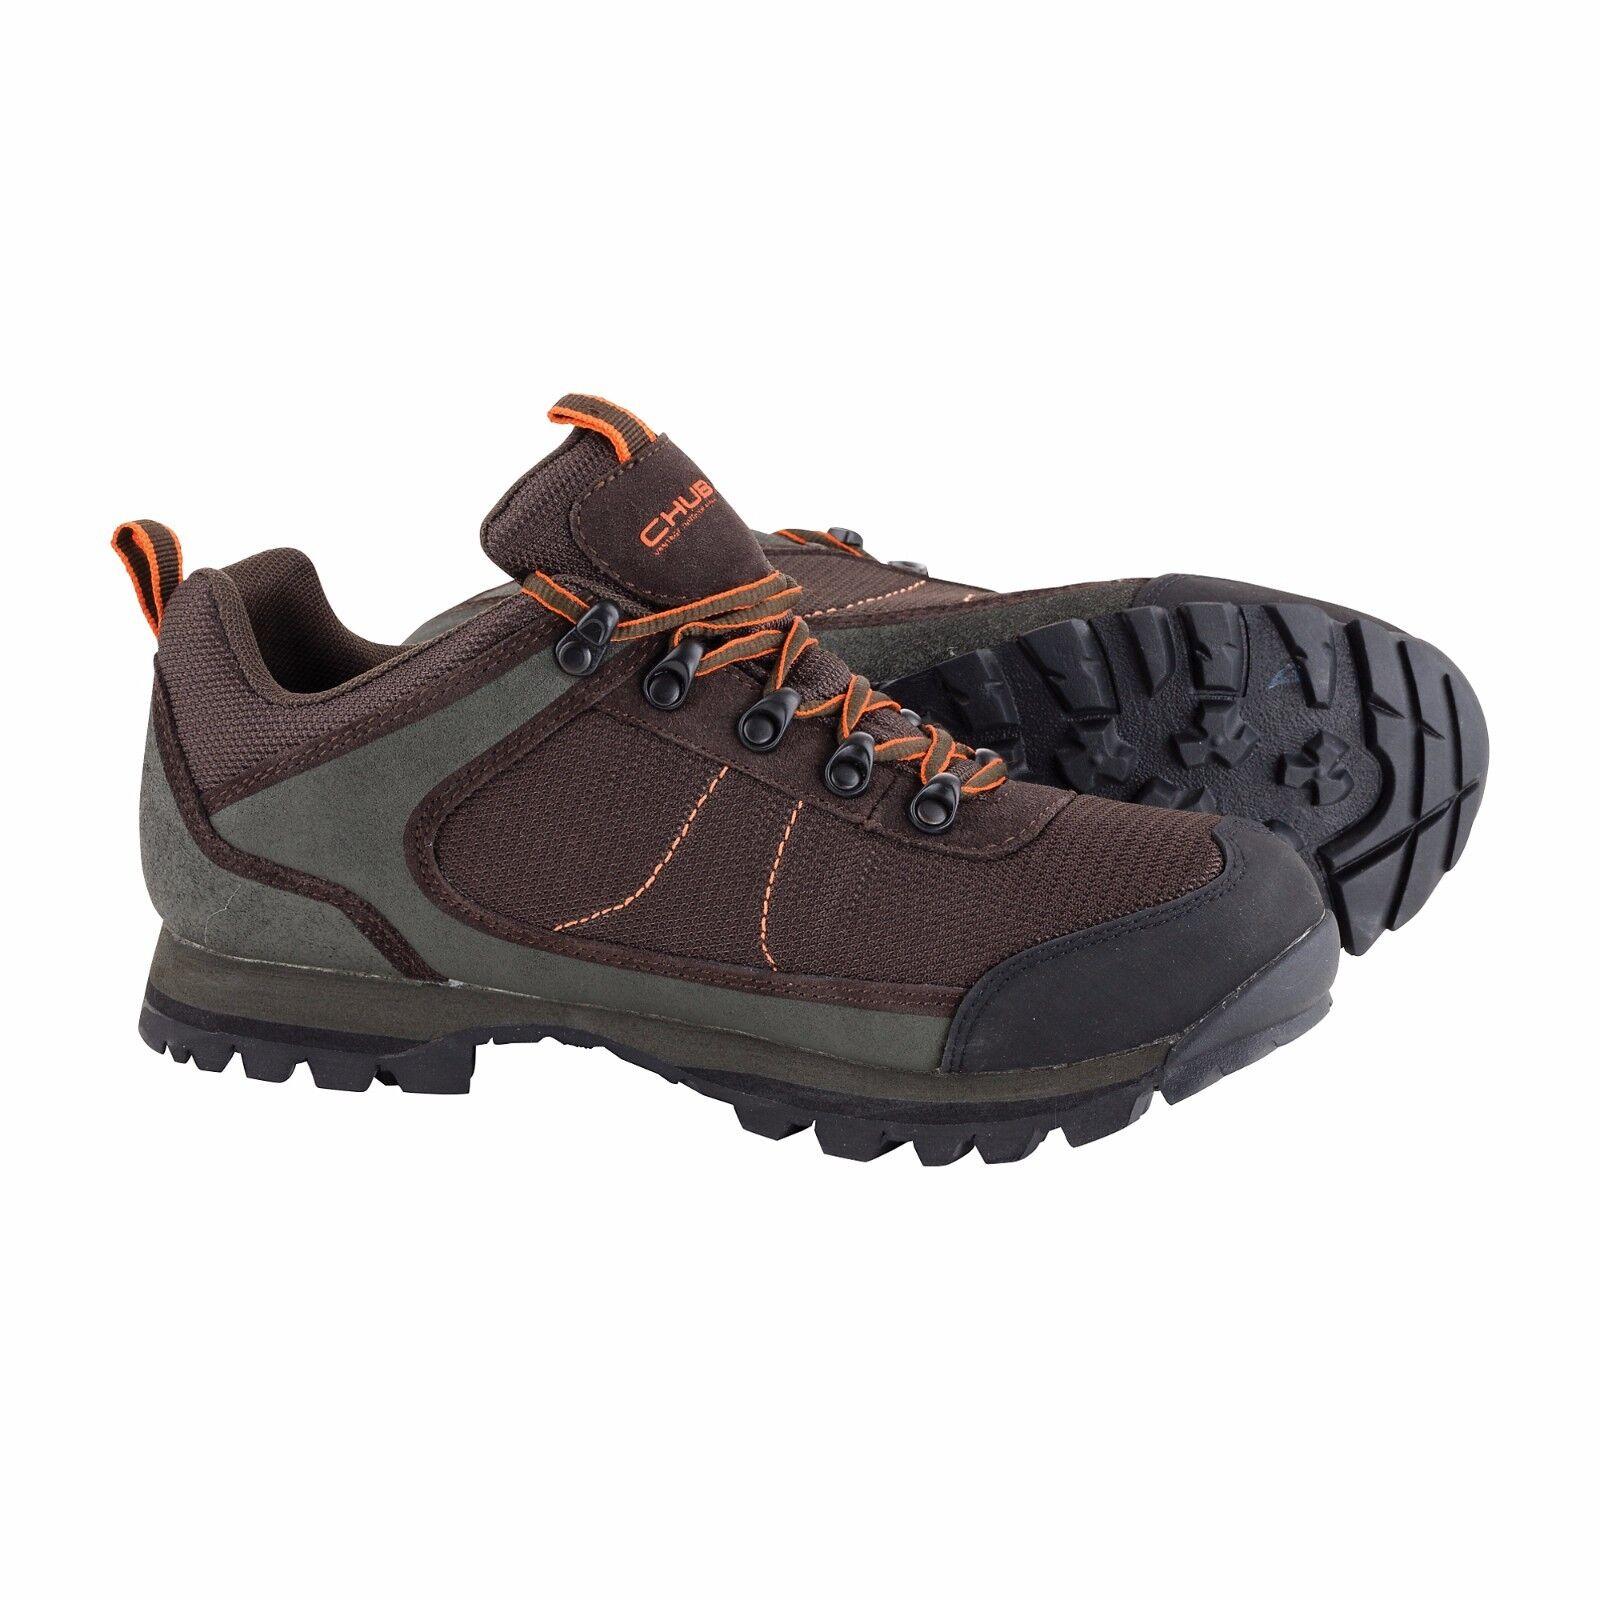 Chub Fishing Vantage Ankle Stiefel - Waterproof, Lightweight, Lightweight, Lightweight, Durable, All Größes 6668f2